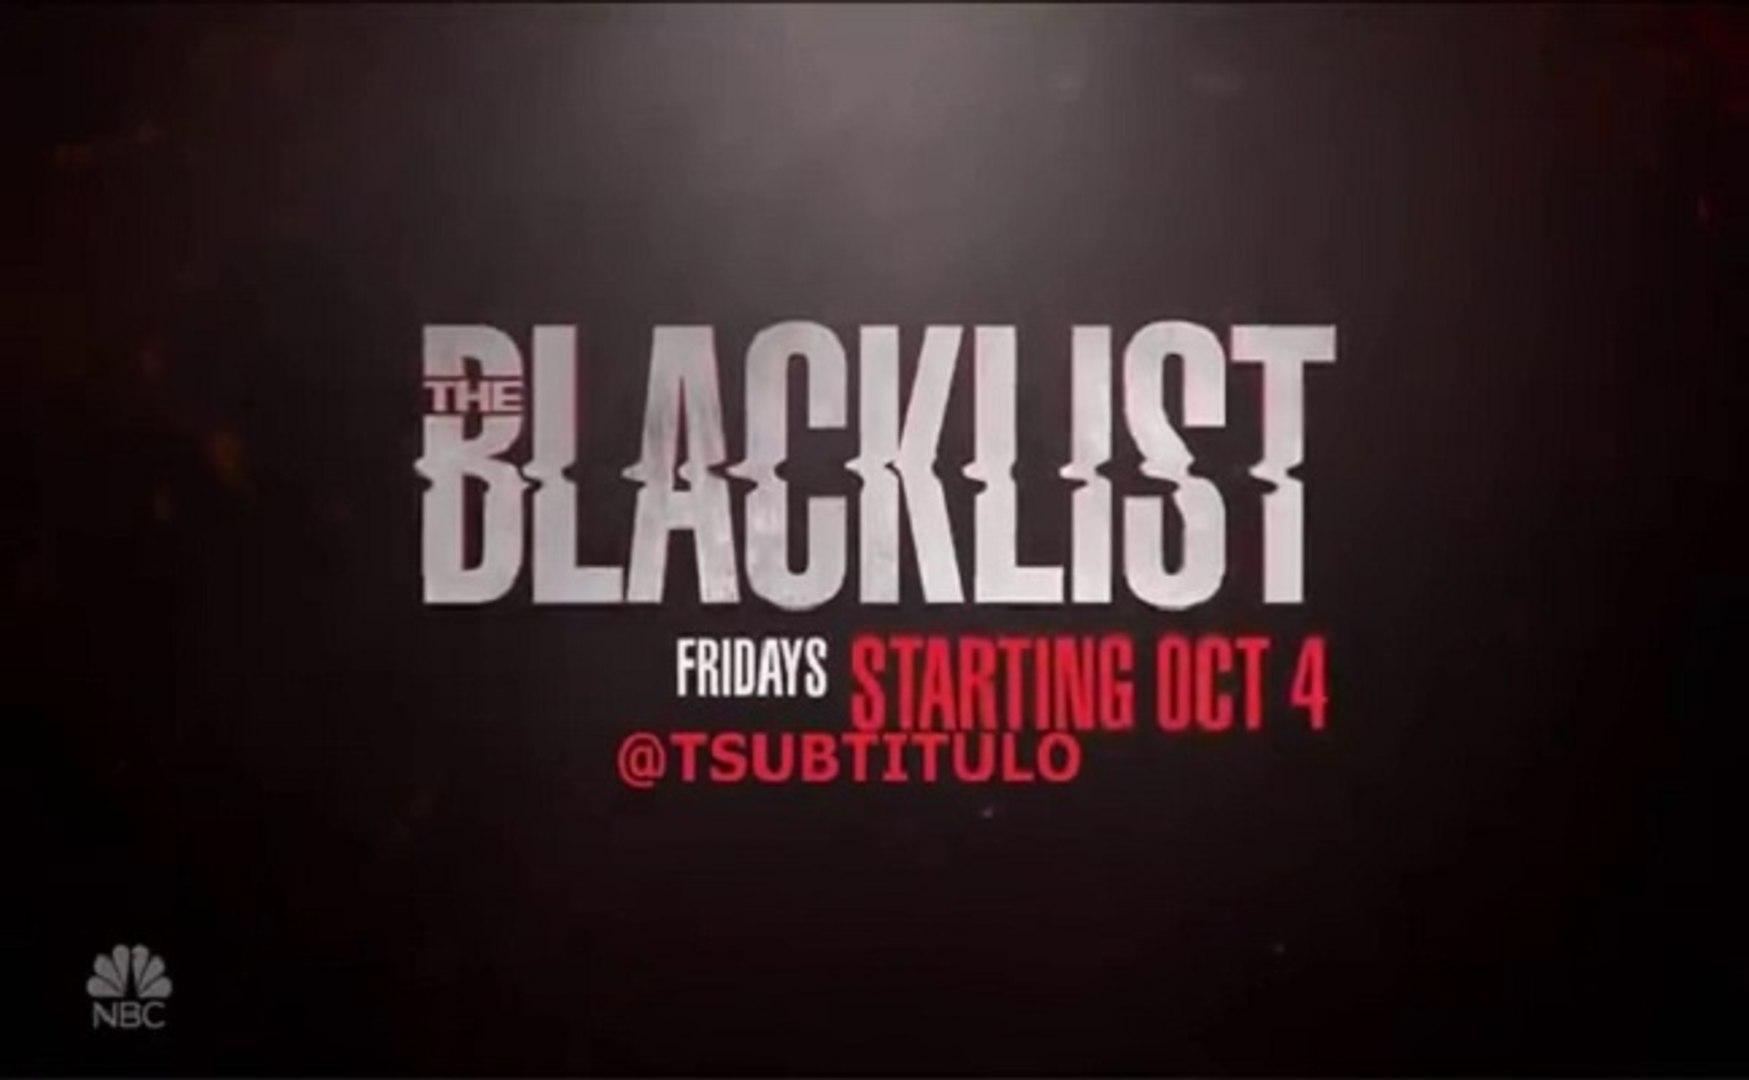 The Blacklist - Trailer Season 7